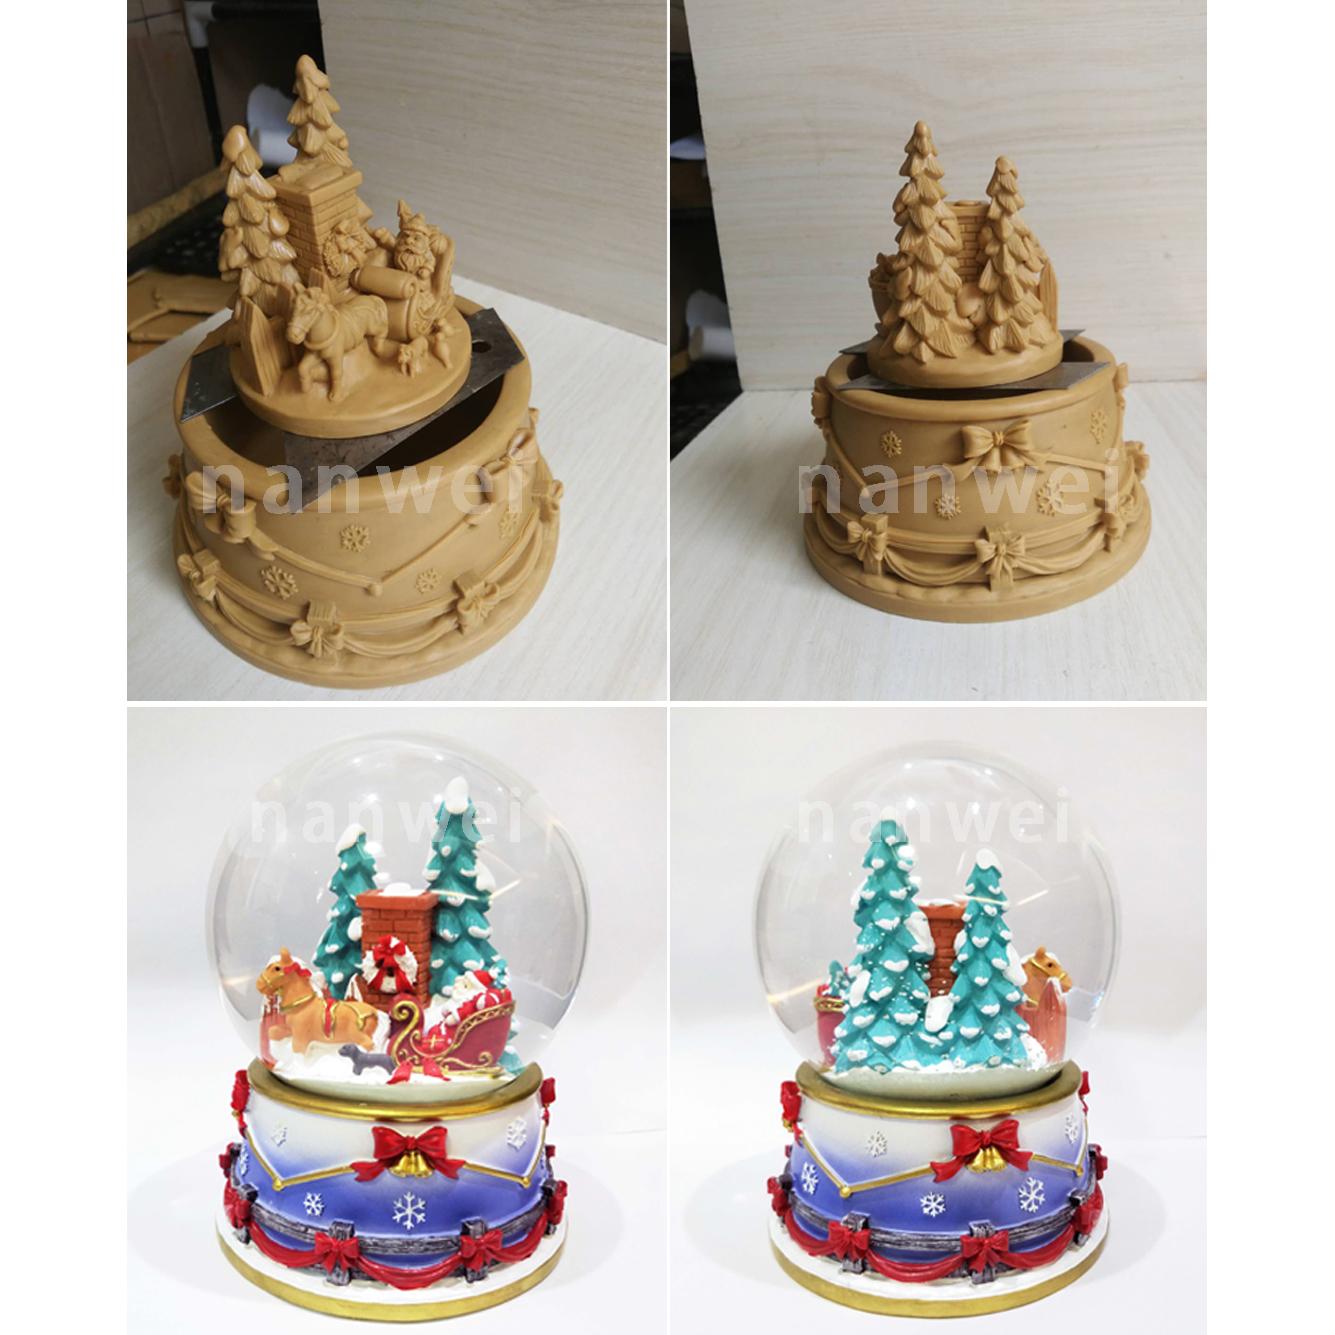 Hot Sale Nanwei Resin Custom Made Christmas Snow Globe with Music